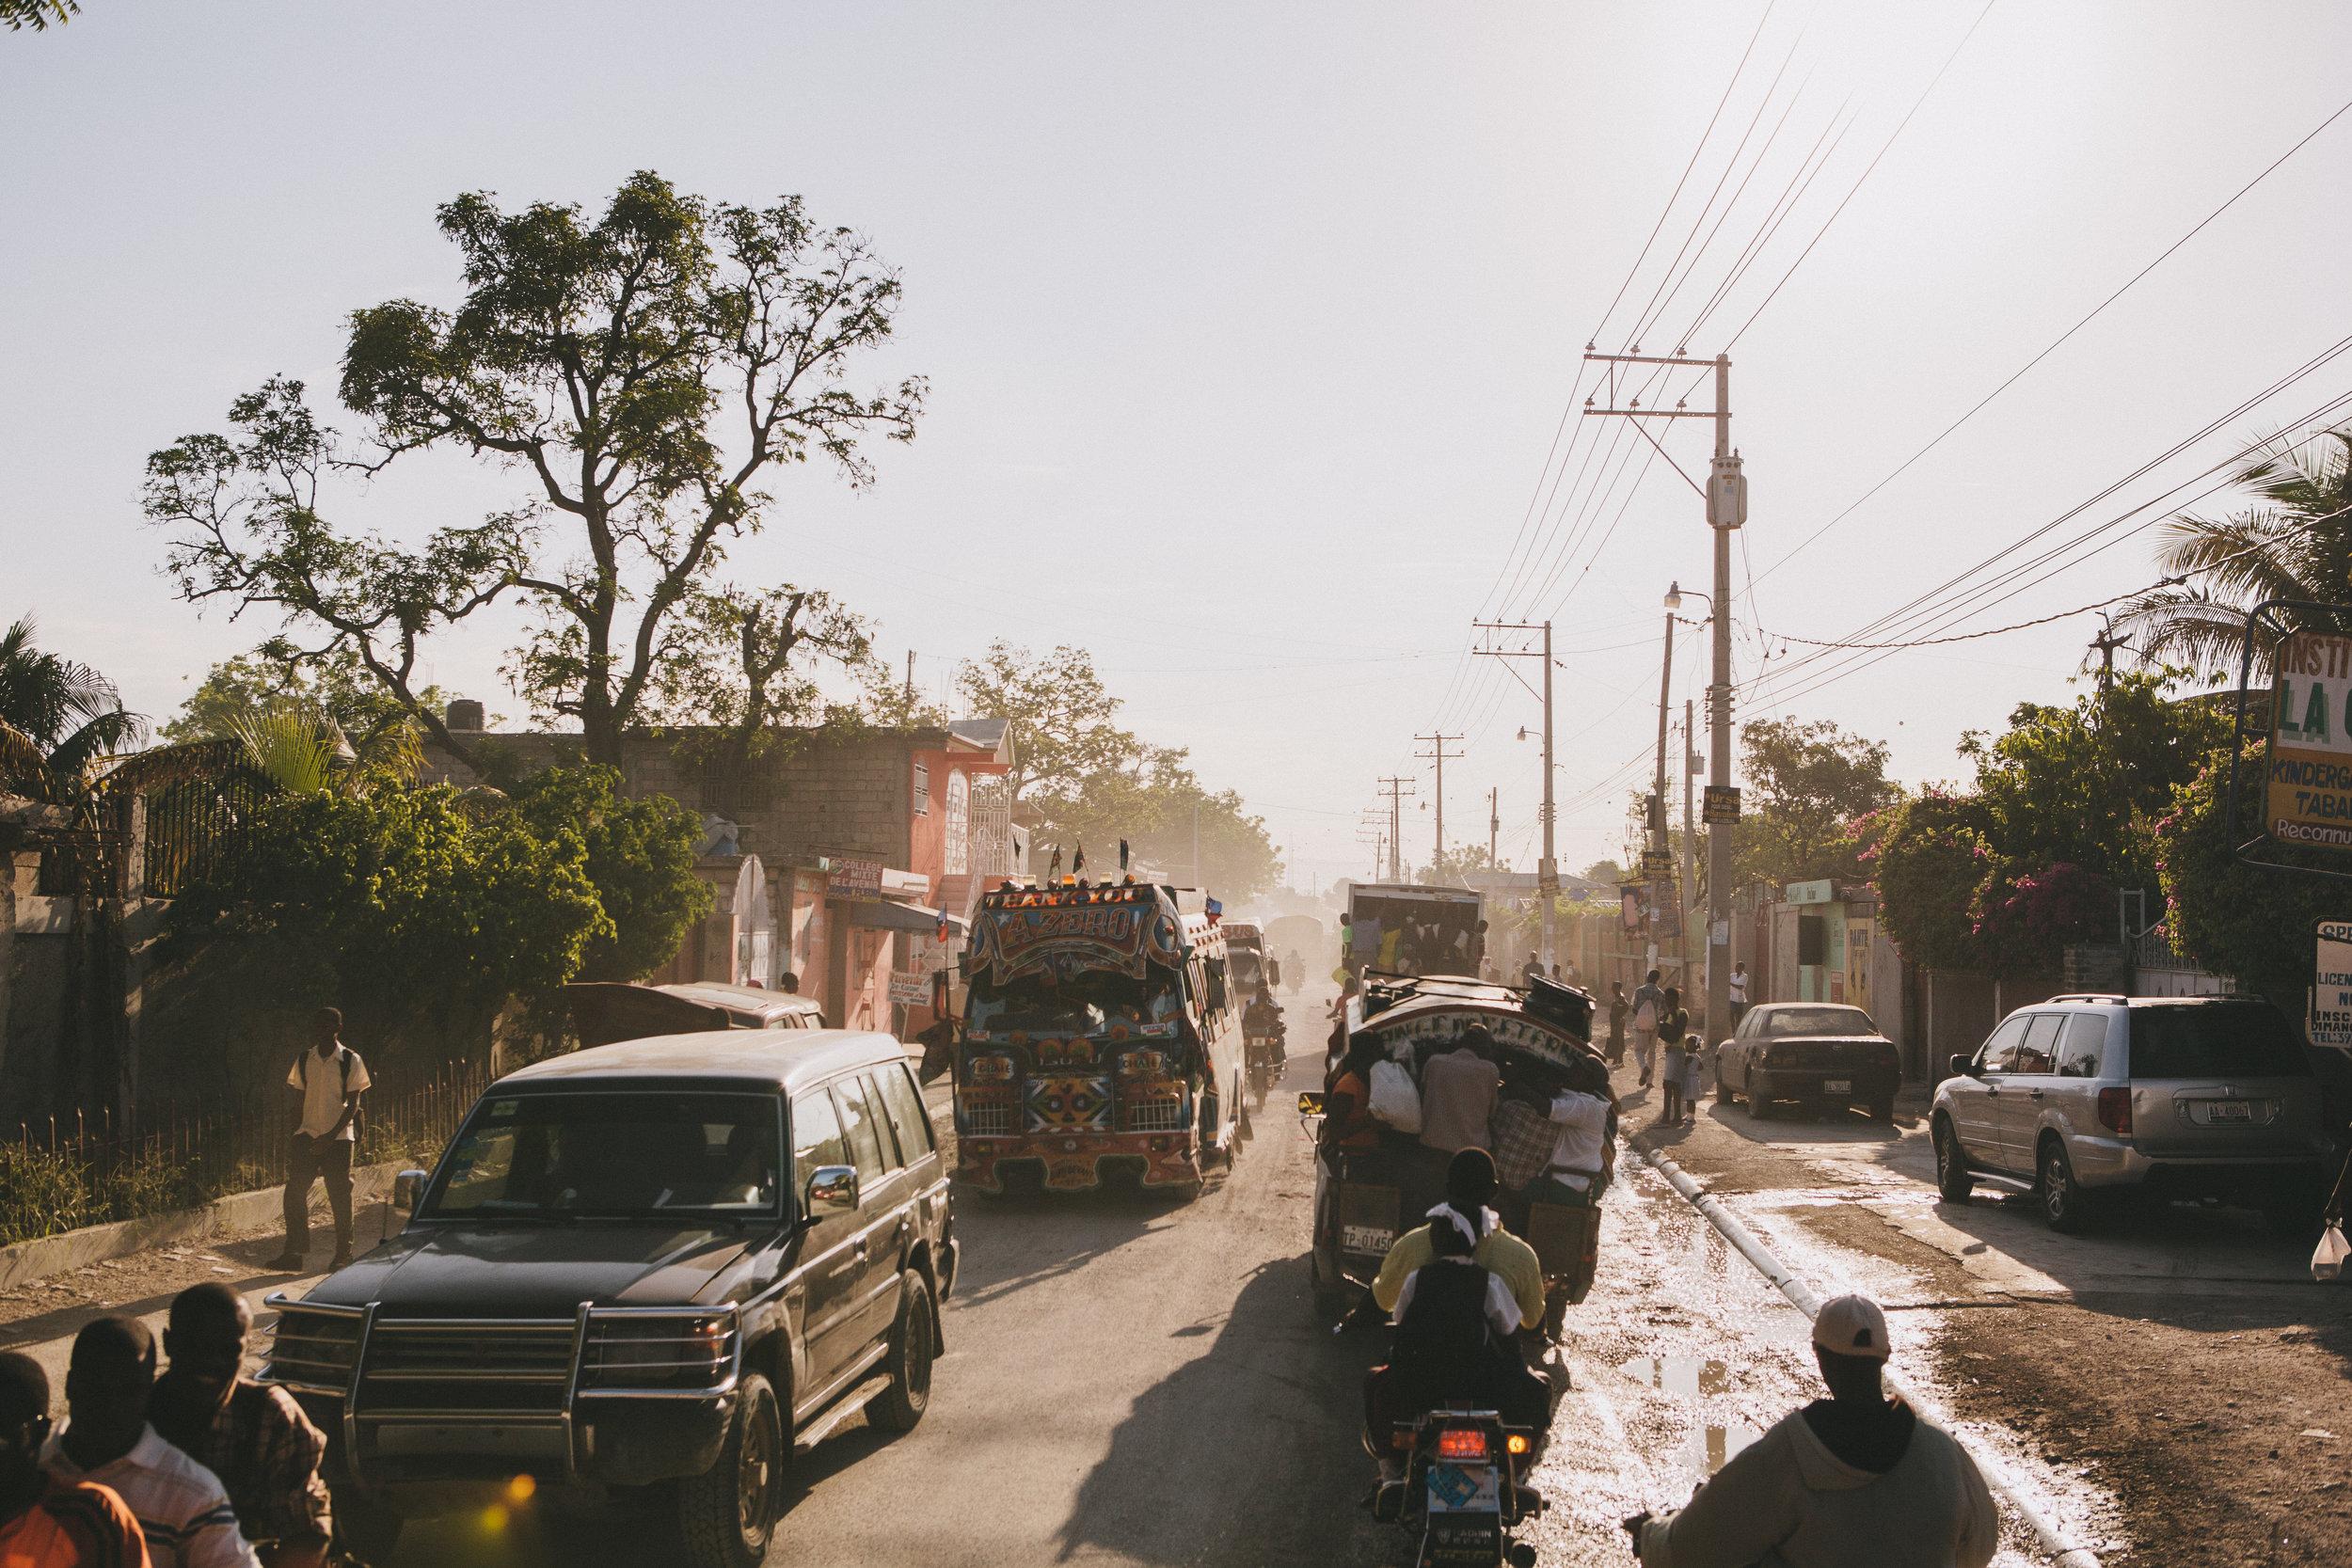 Haiti_Street_Scenes_008.jpg